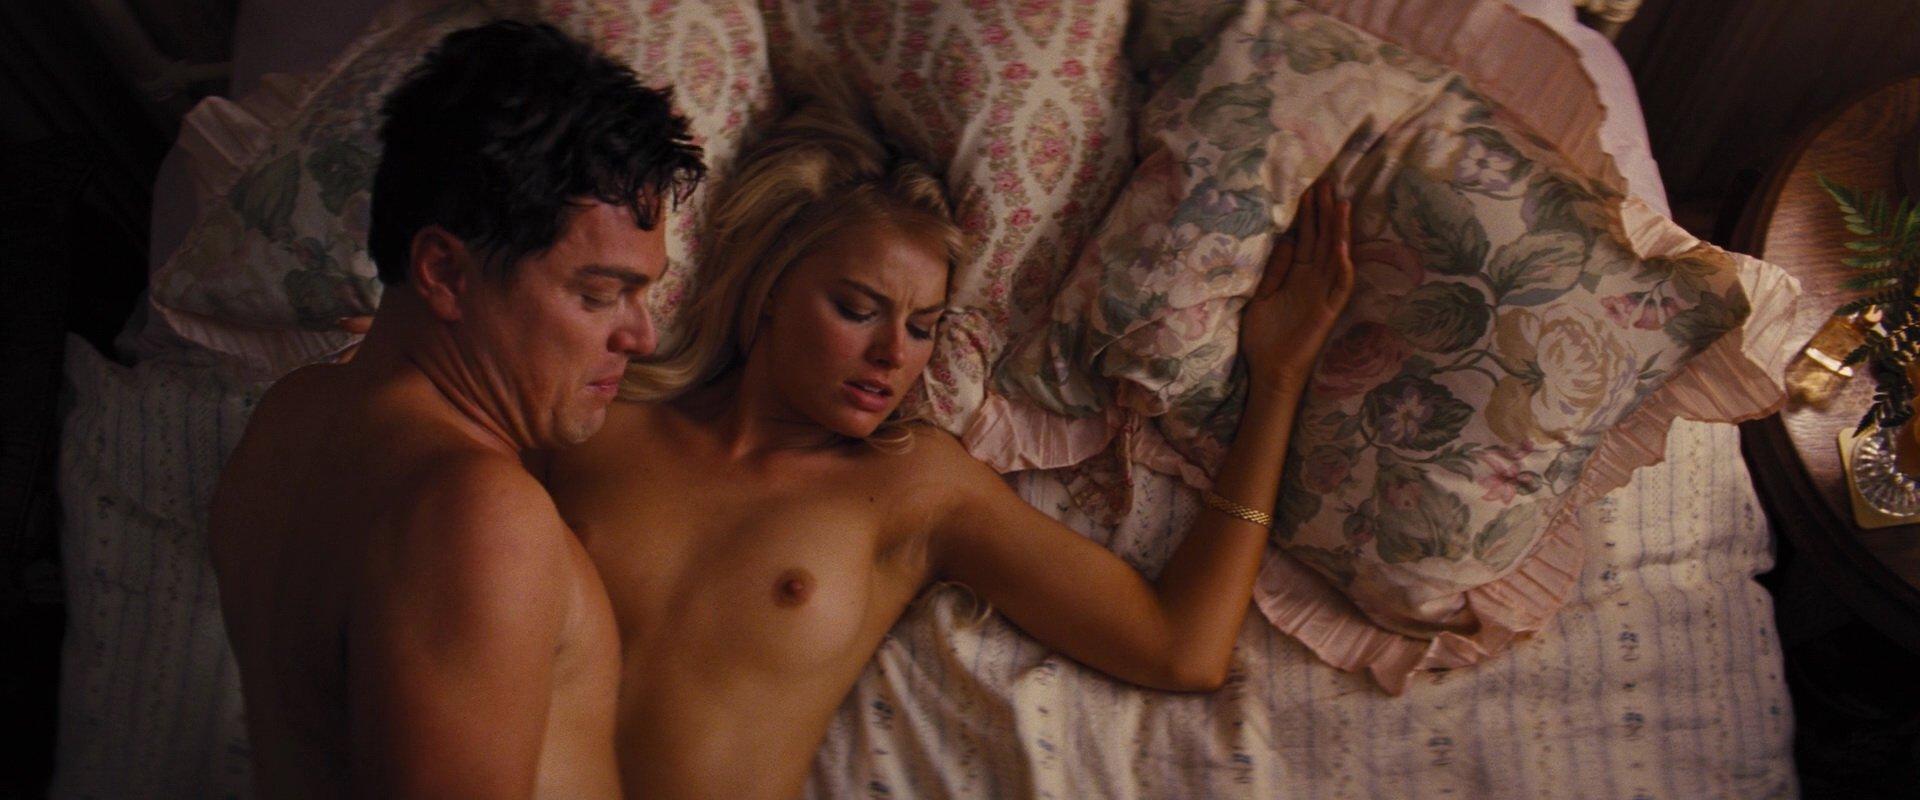 Margot robbie nude wolf of wall street spreading Naomi Wolf Of Wall Street Sex Scenes Datawav